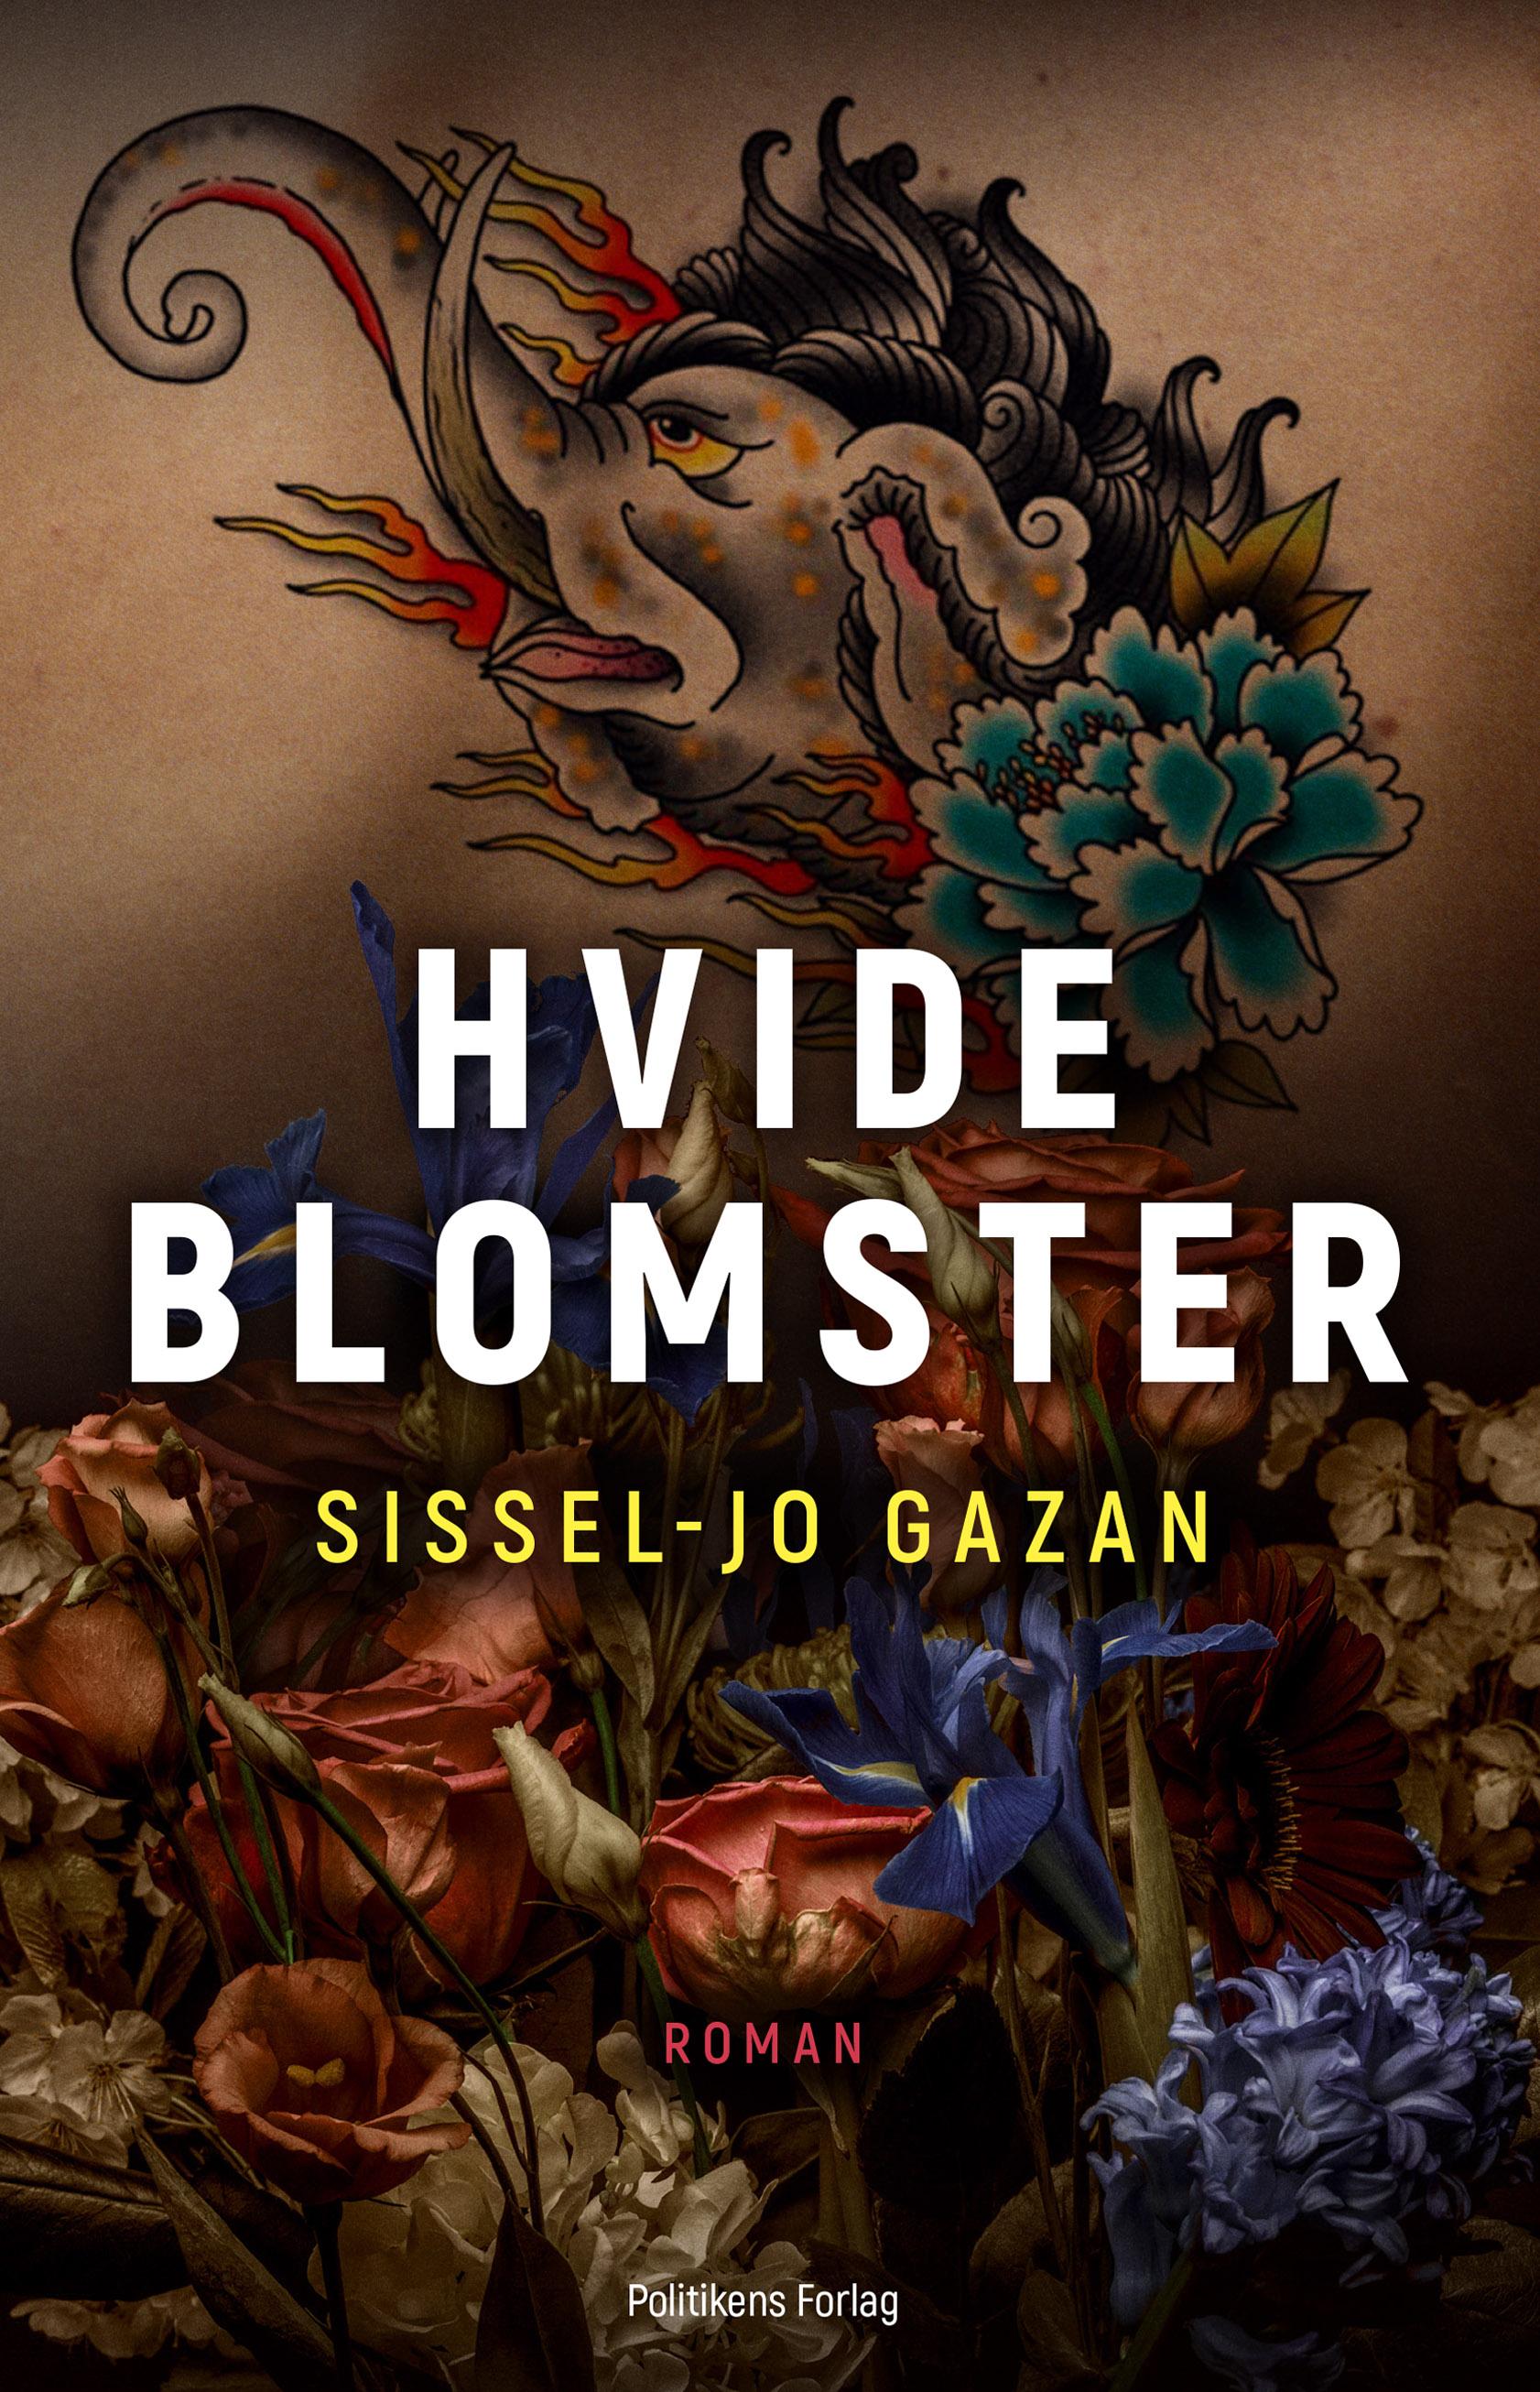 Hvide blomster - Sissel-Jo Gazan - Bøger - Politikens Forlag - 9788740050820 - 6/10-2020